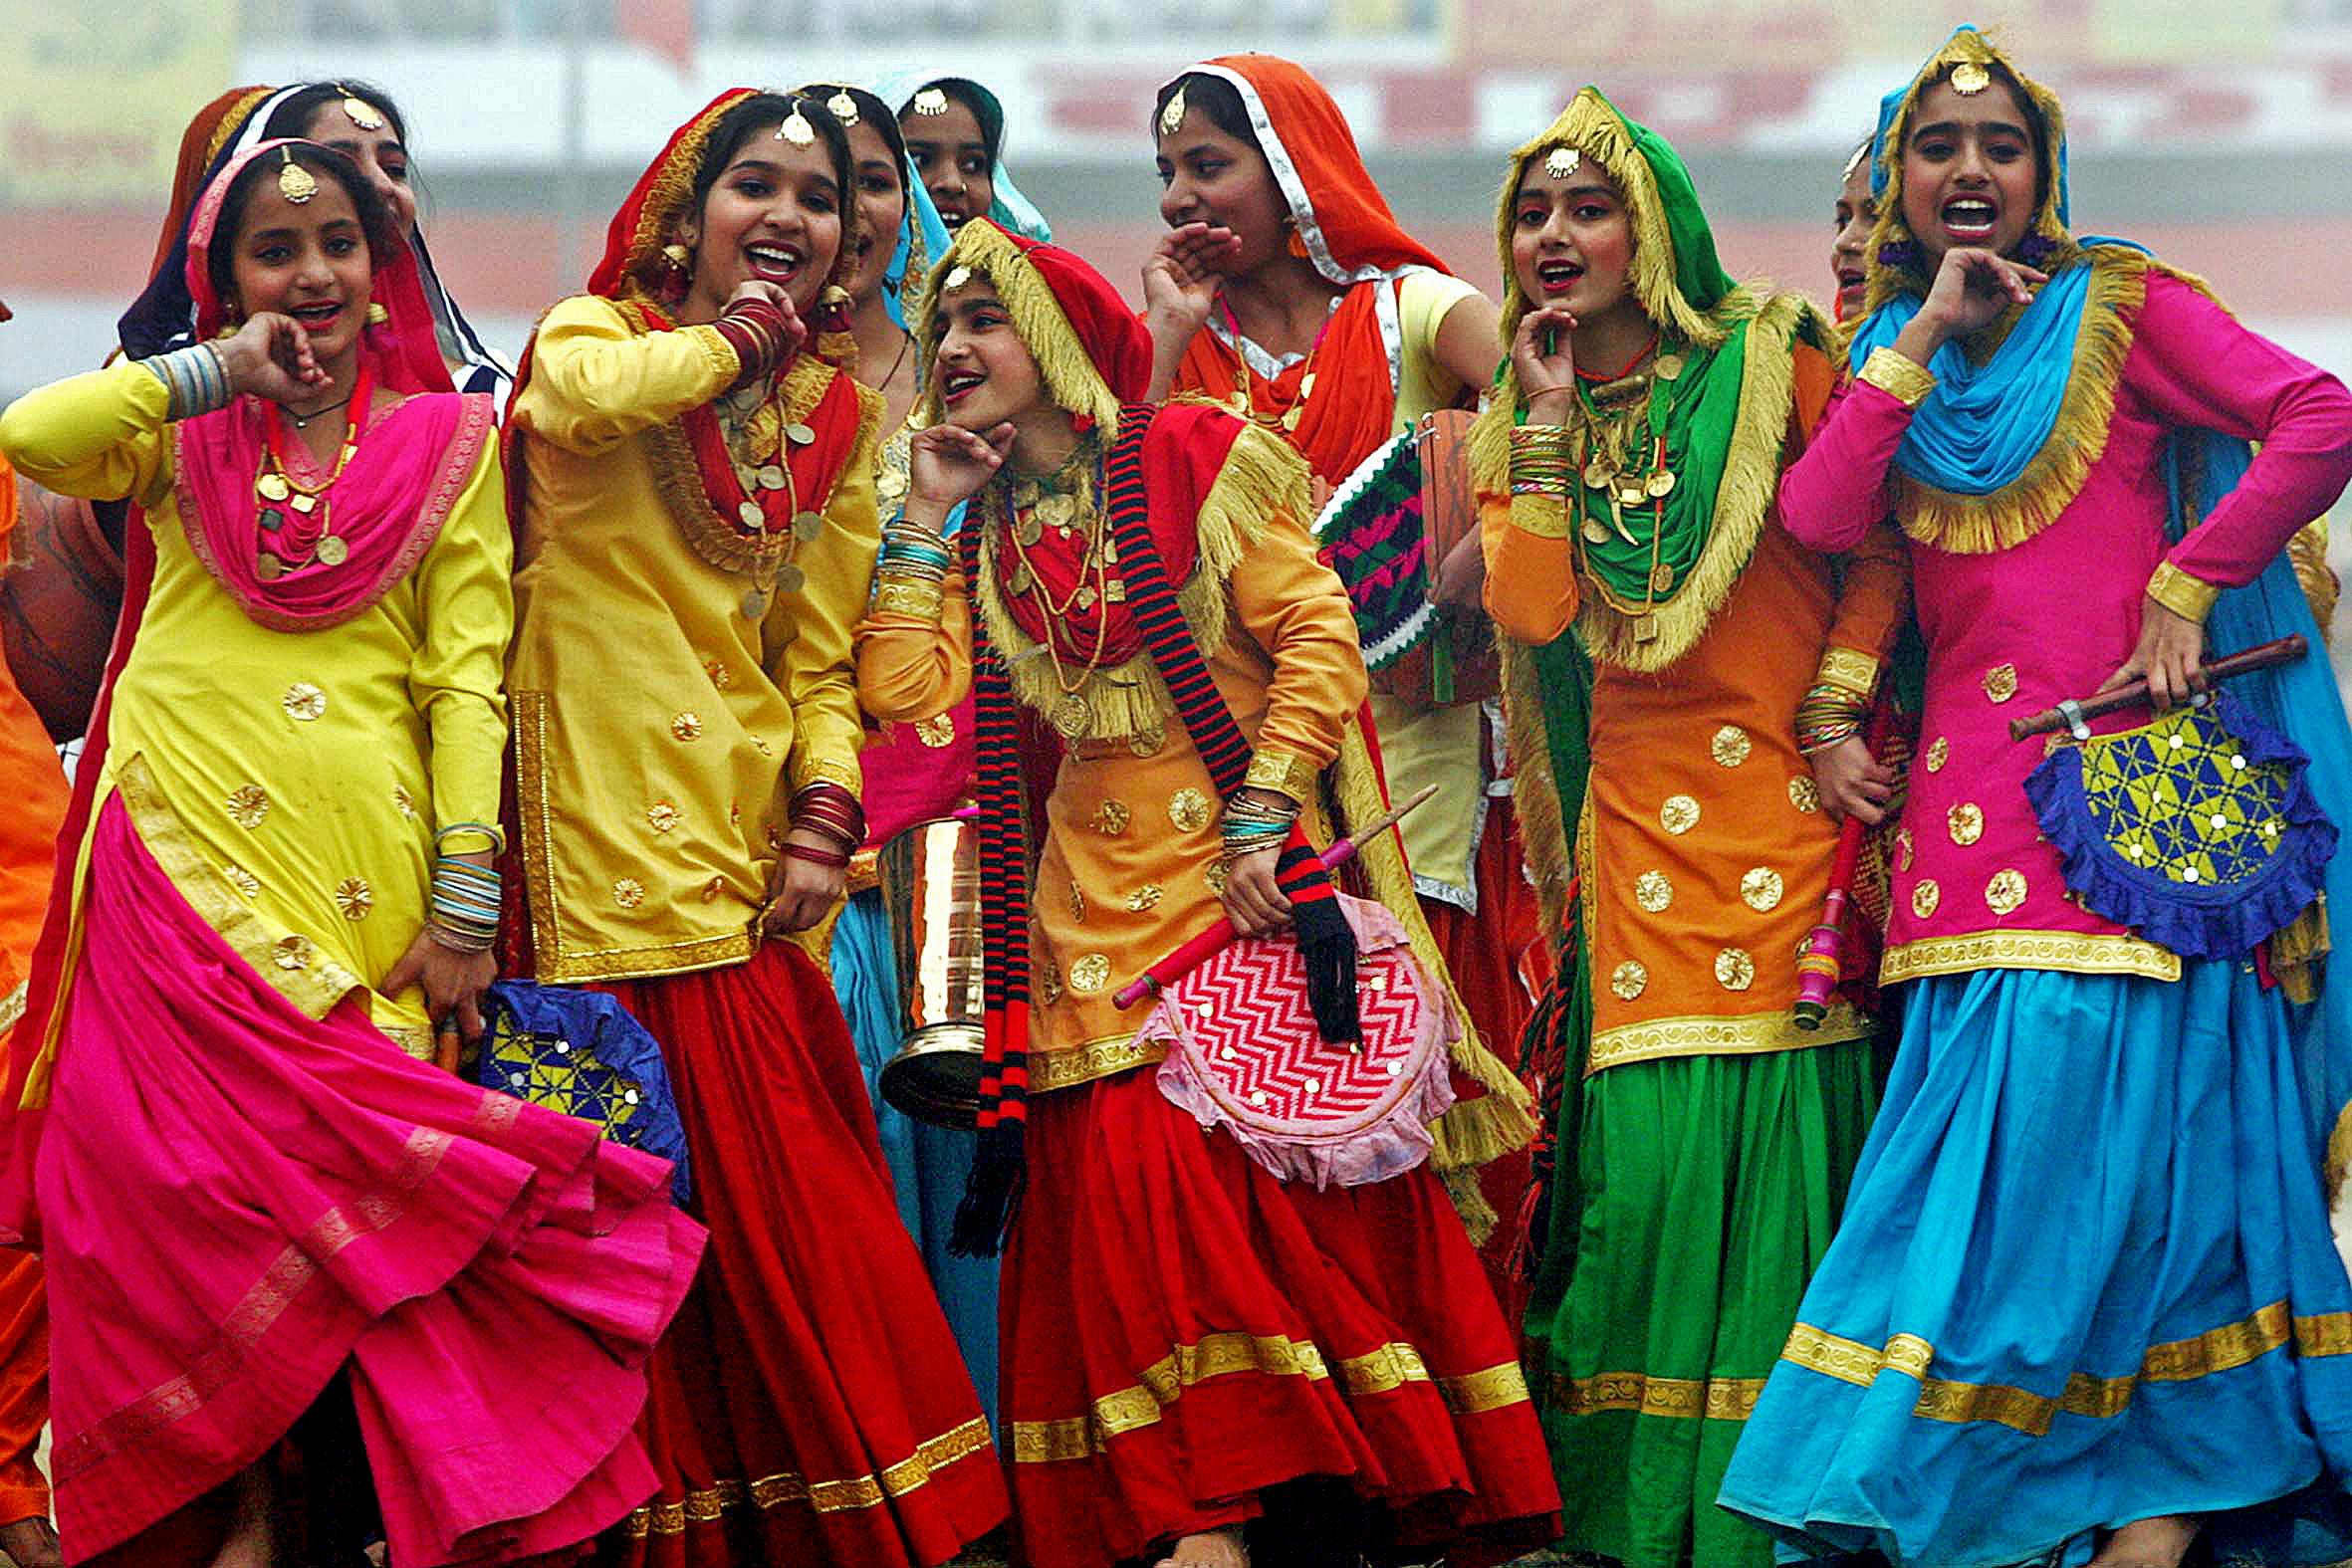 Farbenfrohe Tänzerinnen